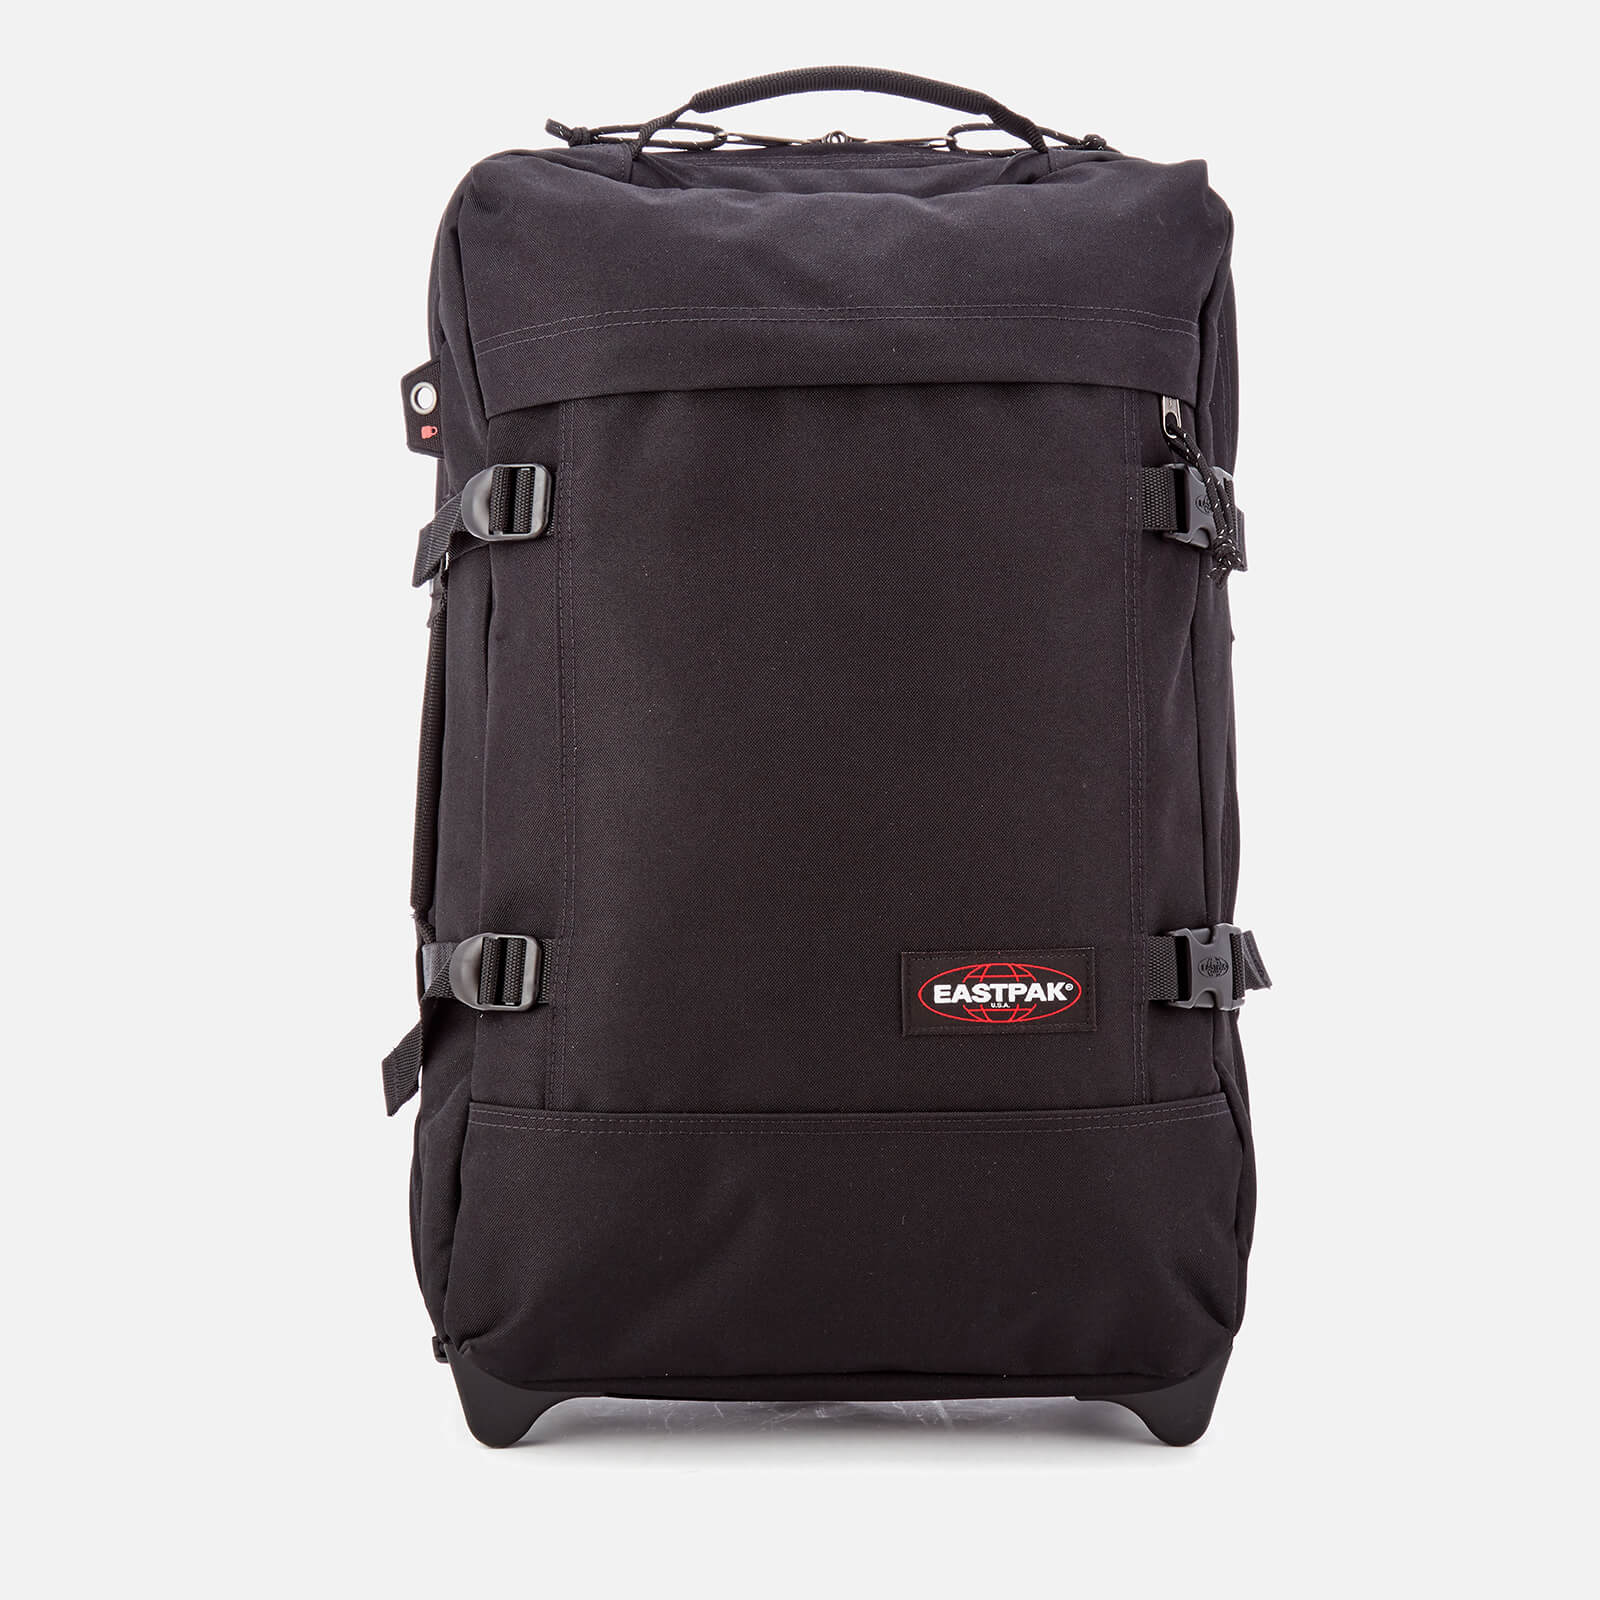 Eastpak Travel Tranverz S Suitcase Black